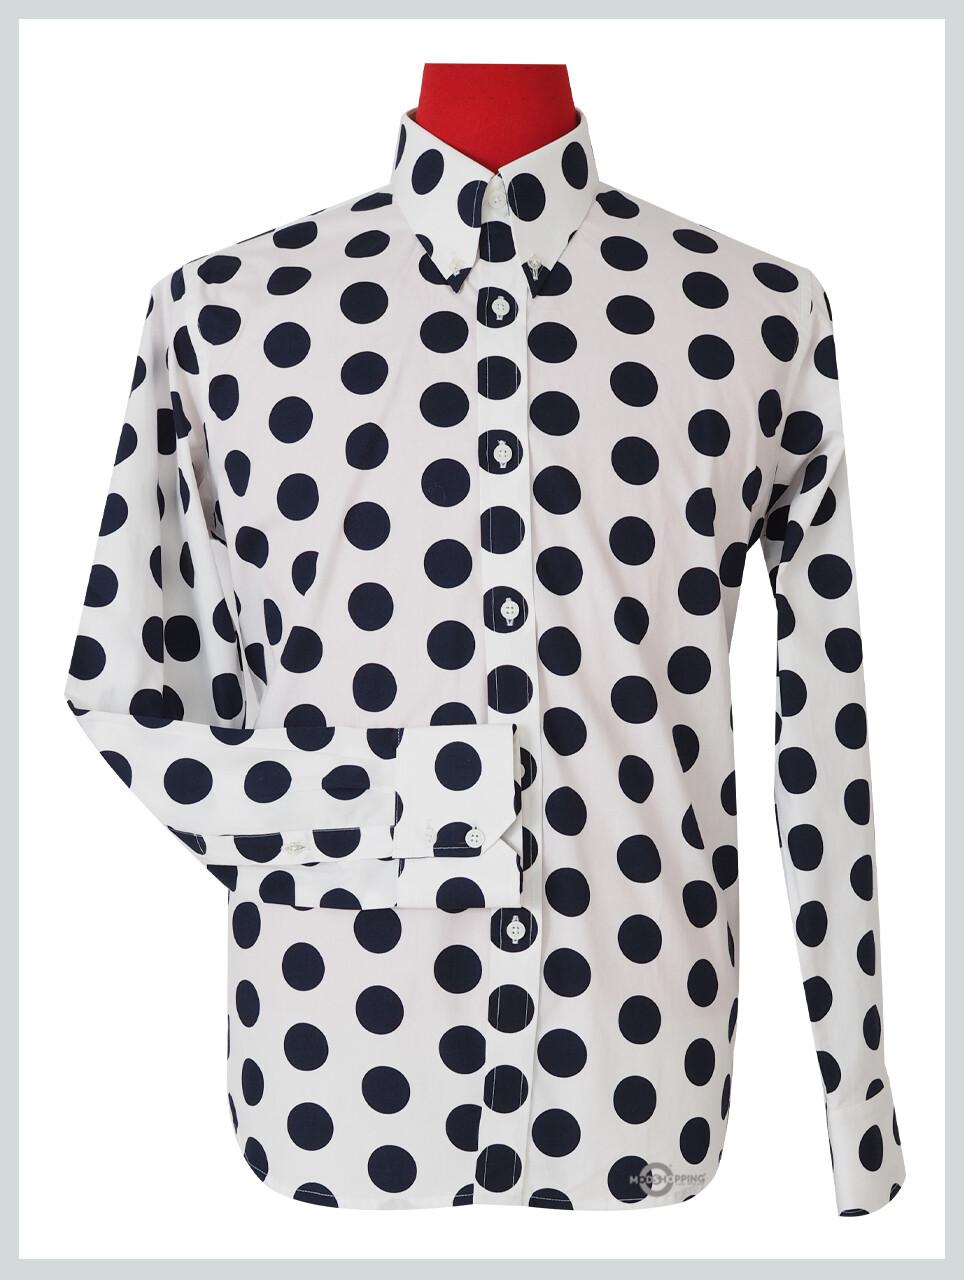 Polka Dot Shirt| Large Dark Navy Blue Dot In White Shirt For Man